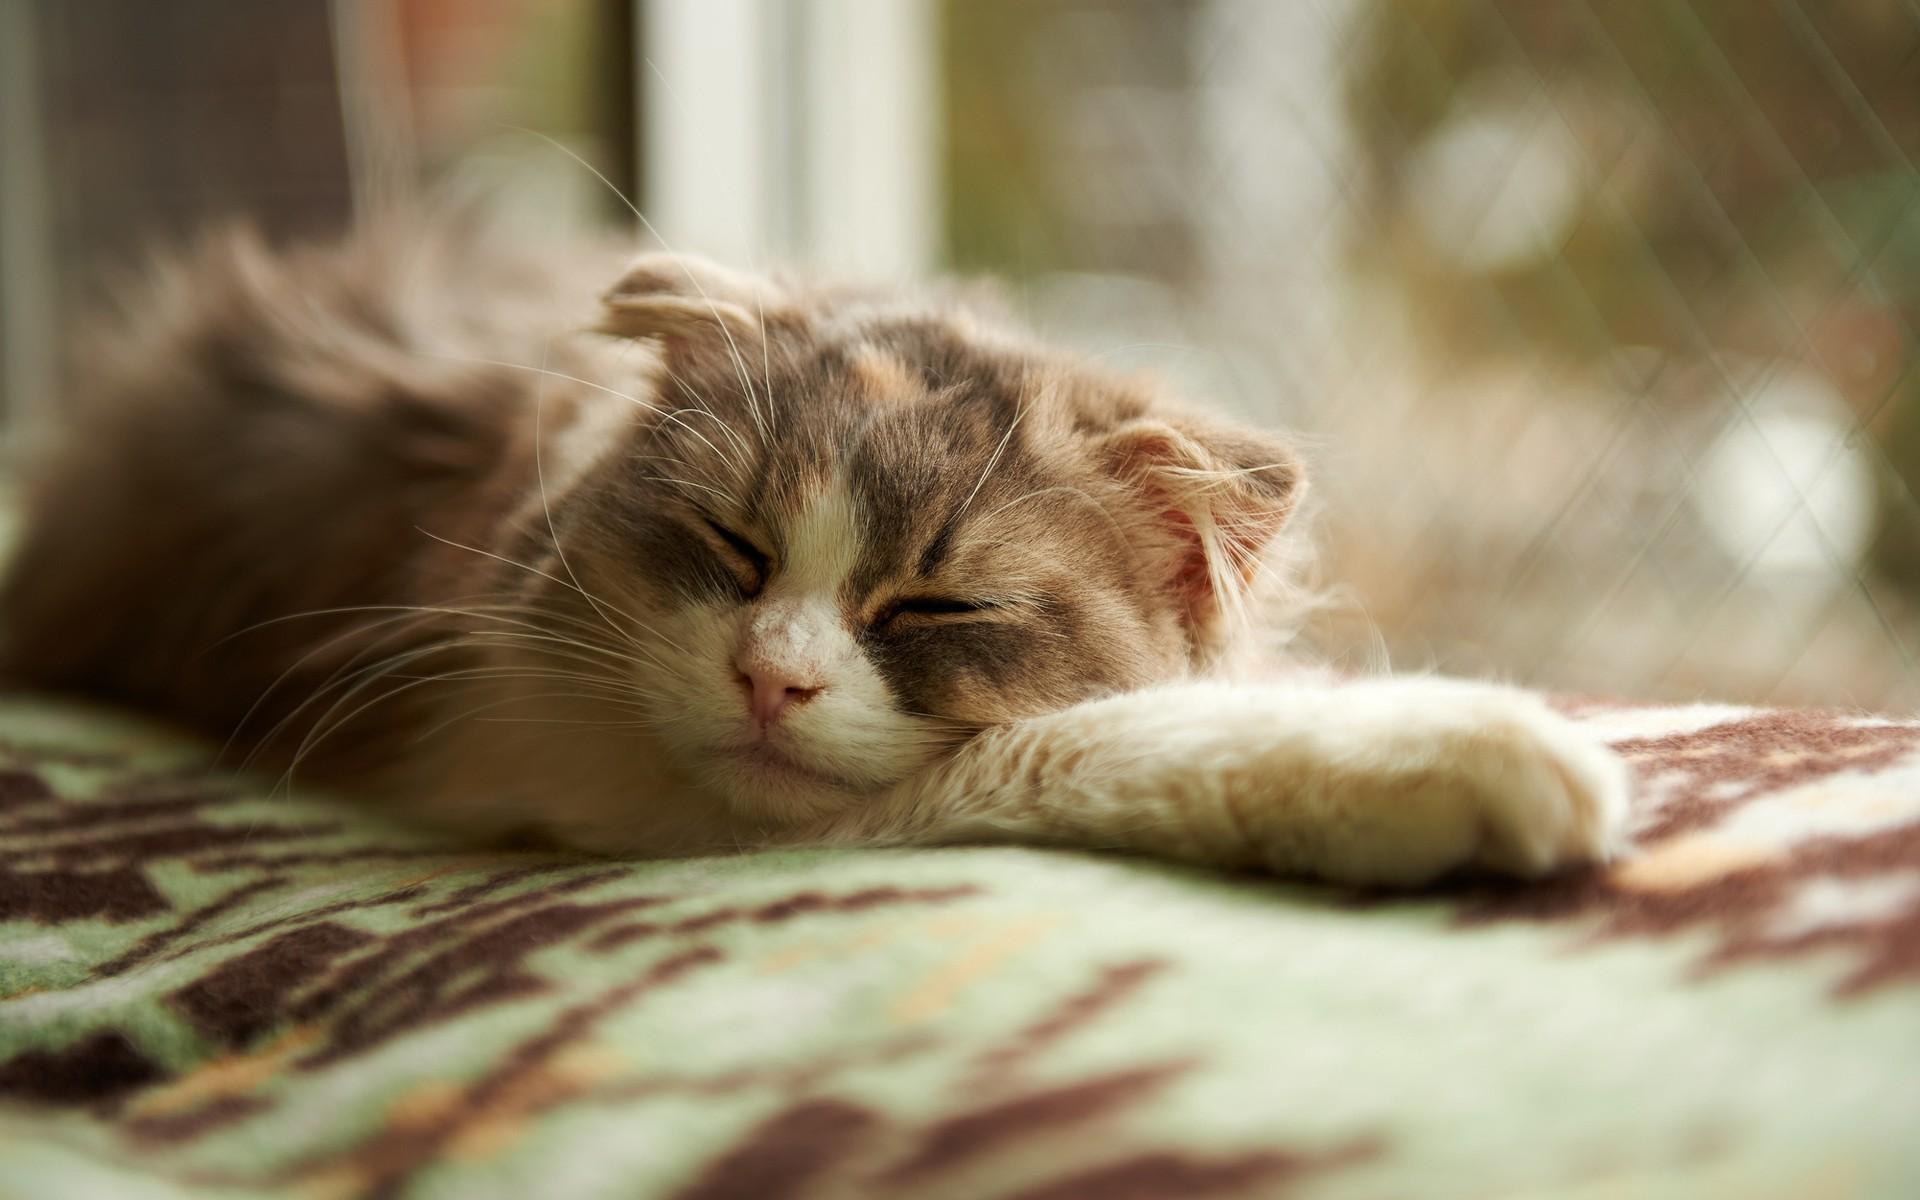 Sleeping Cat Wallpapers 40324 1920x1200px 1920x1200